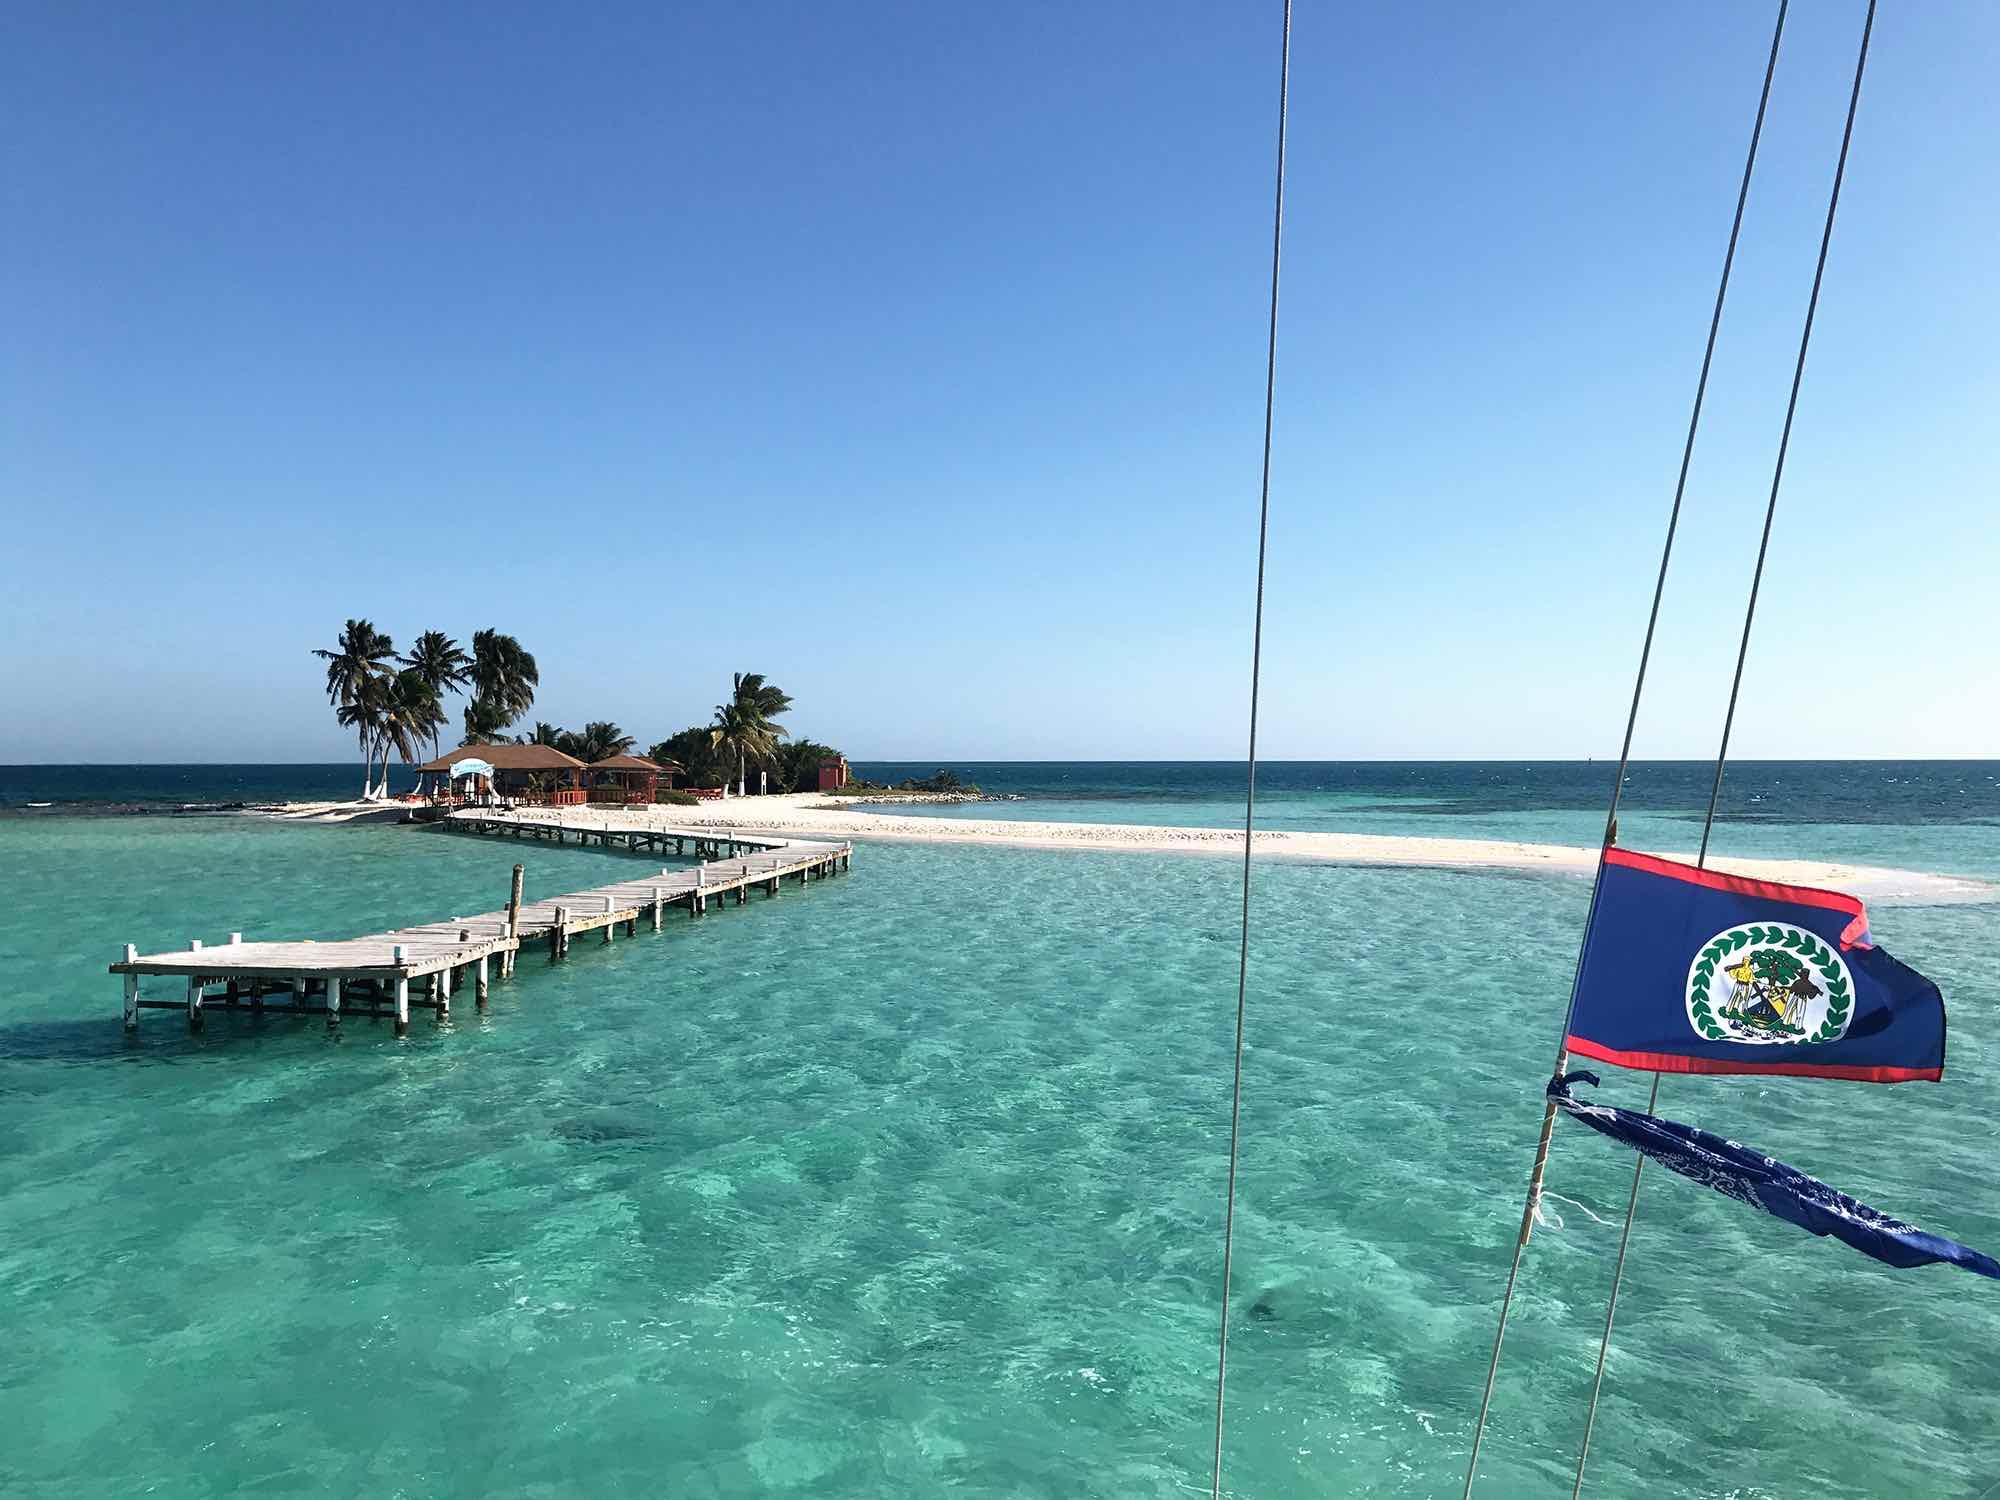 Goff's Caye, Belize